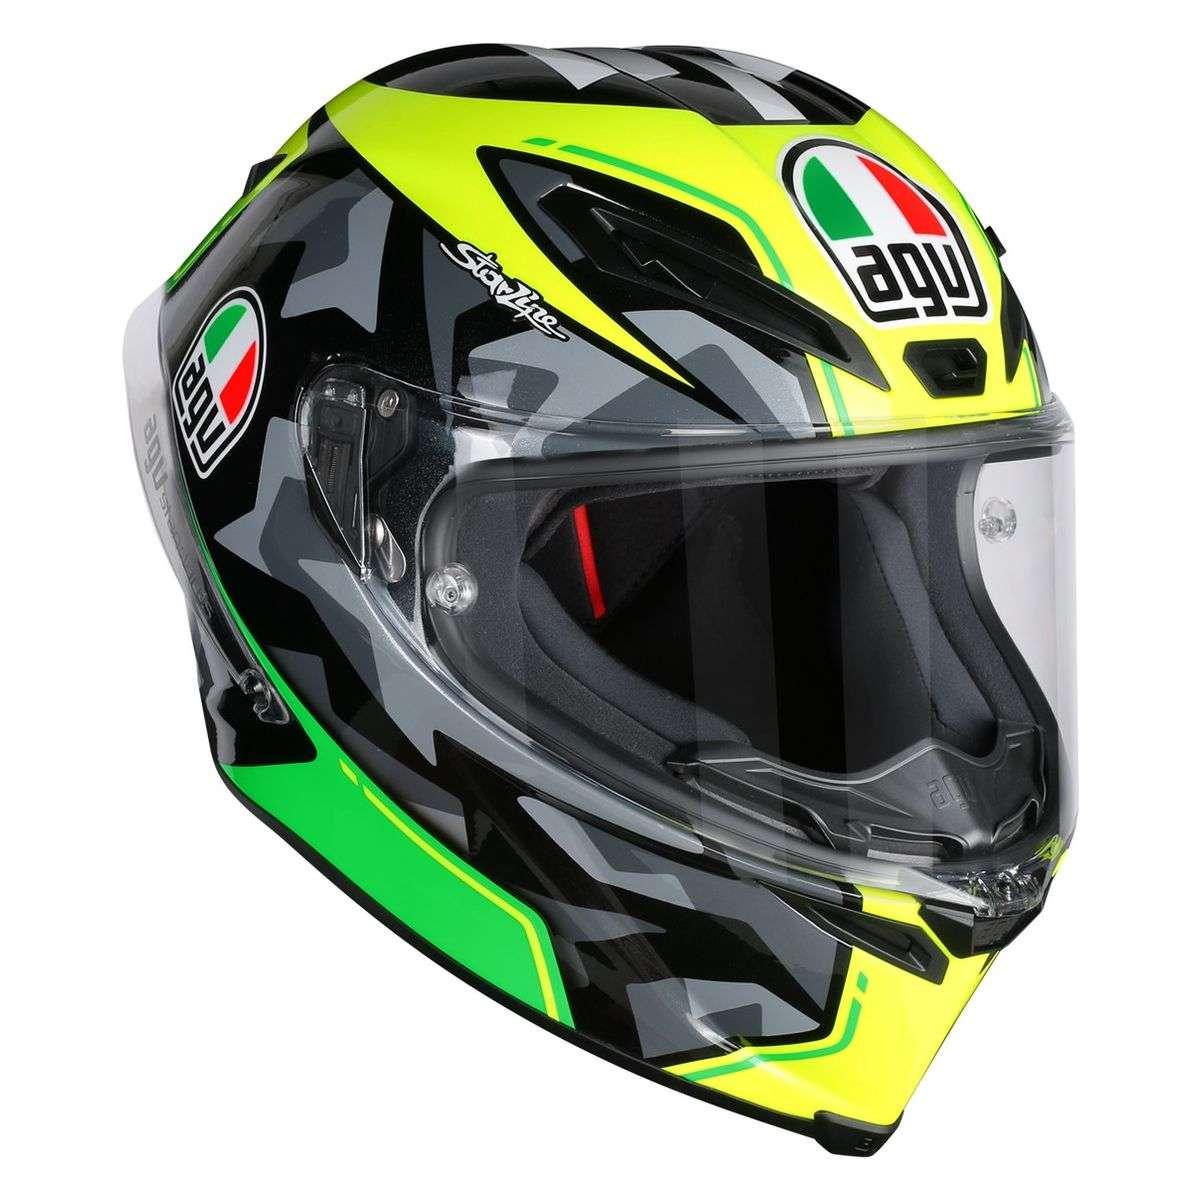 Helmet Ducati Rossi